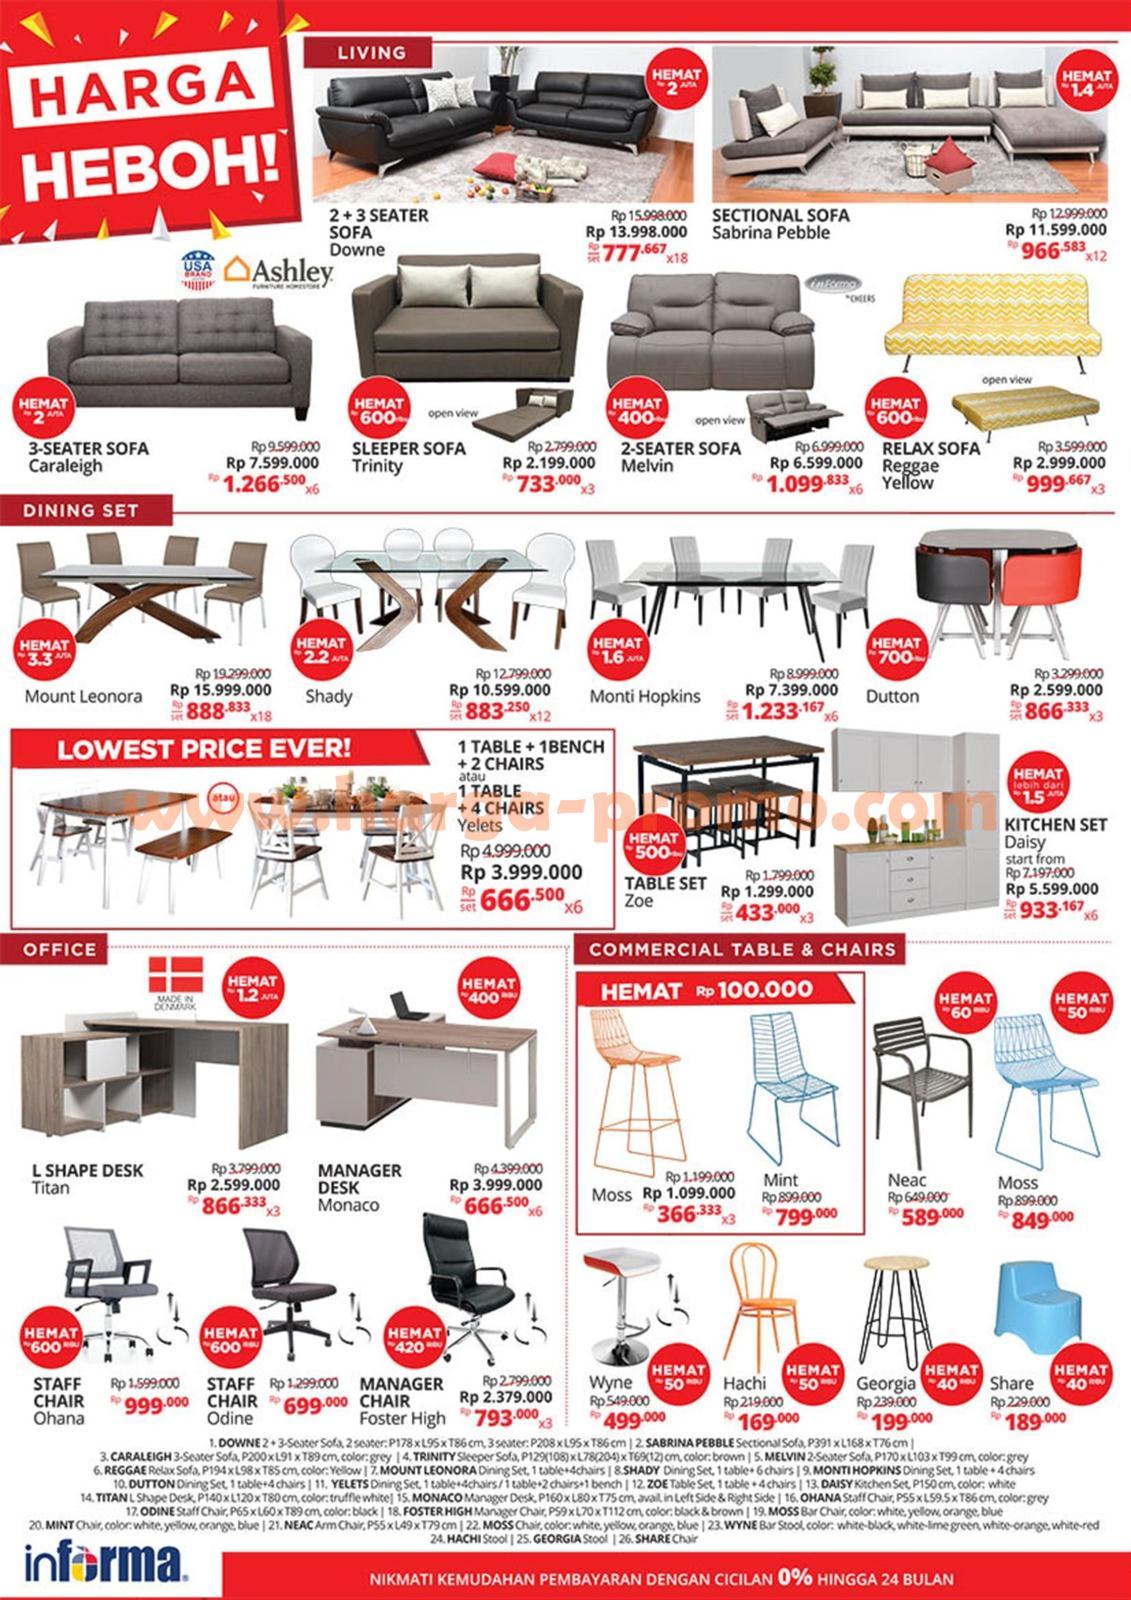 Katalog Sofa Informa 2017 Review Home Co Voucher Rma Source Dapatkan Update Promo Terbaru Di Fanspage